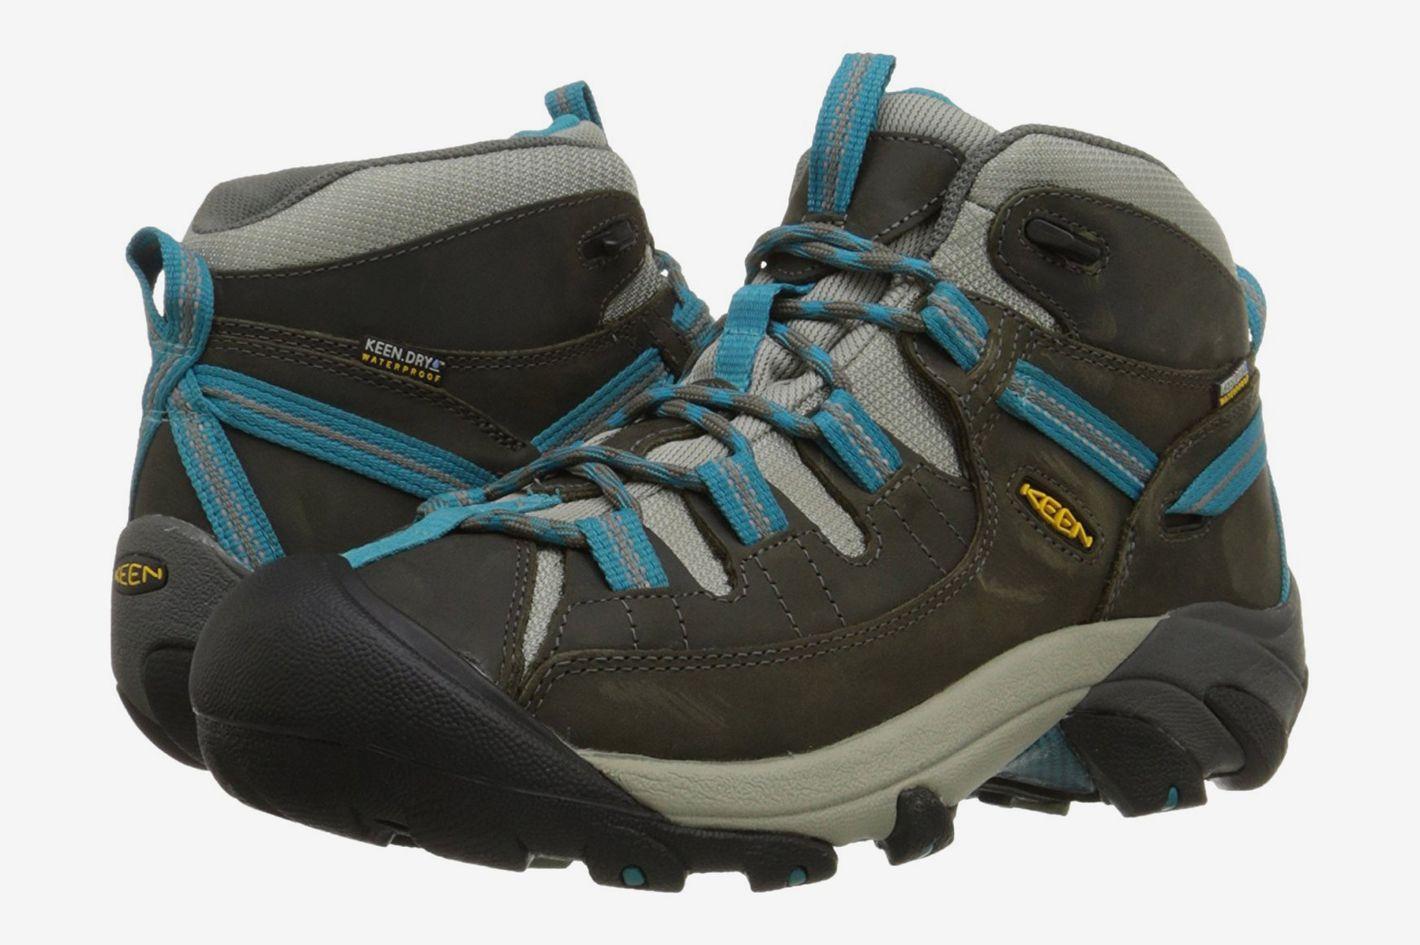 keen Best women's hiking boots that don't need breaking in